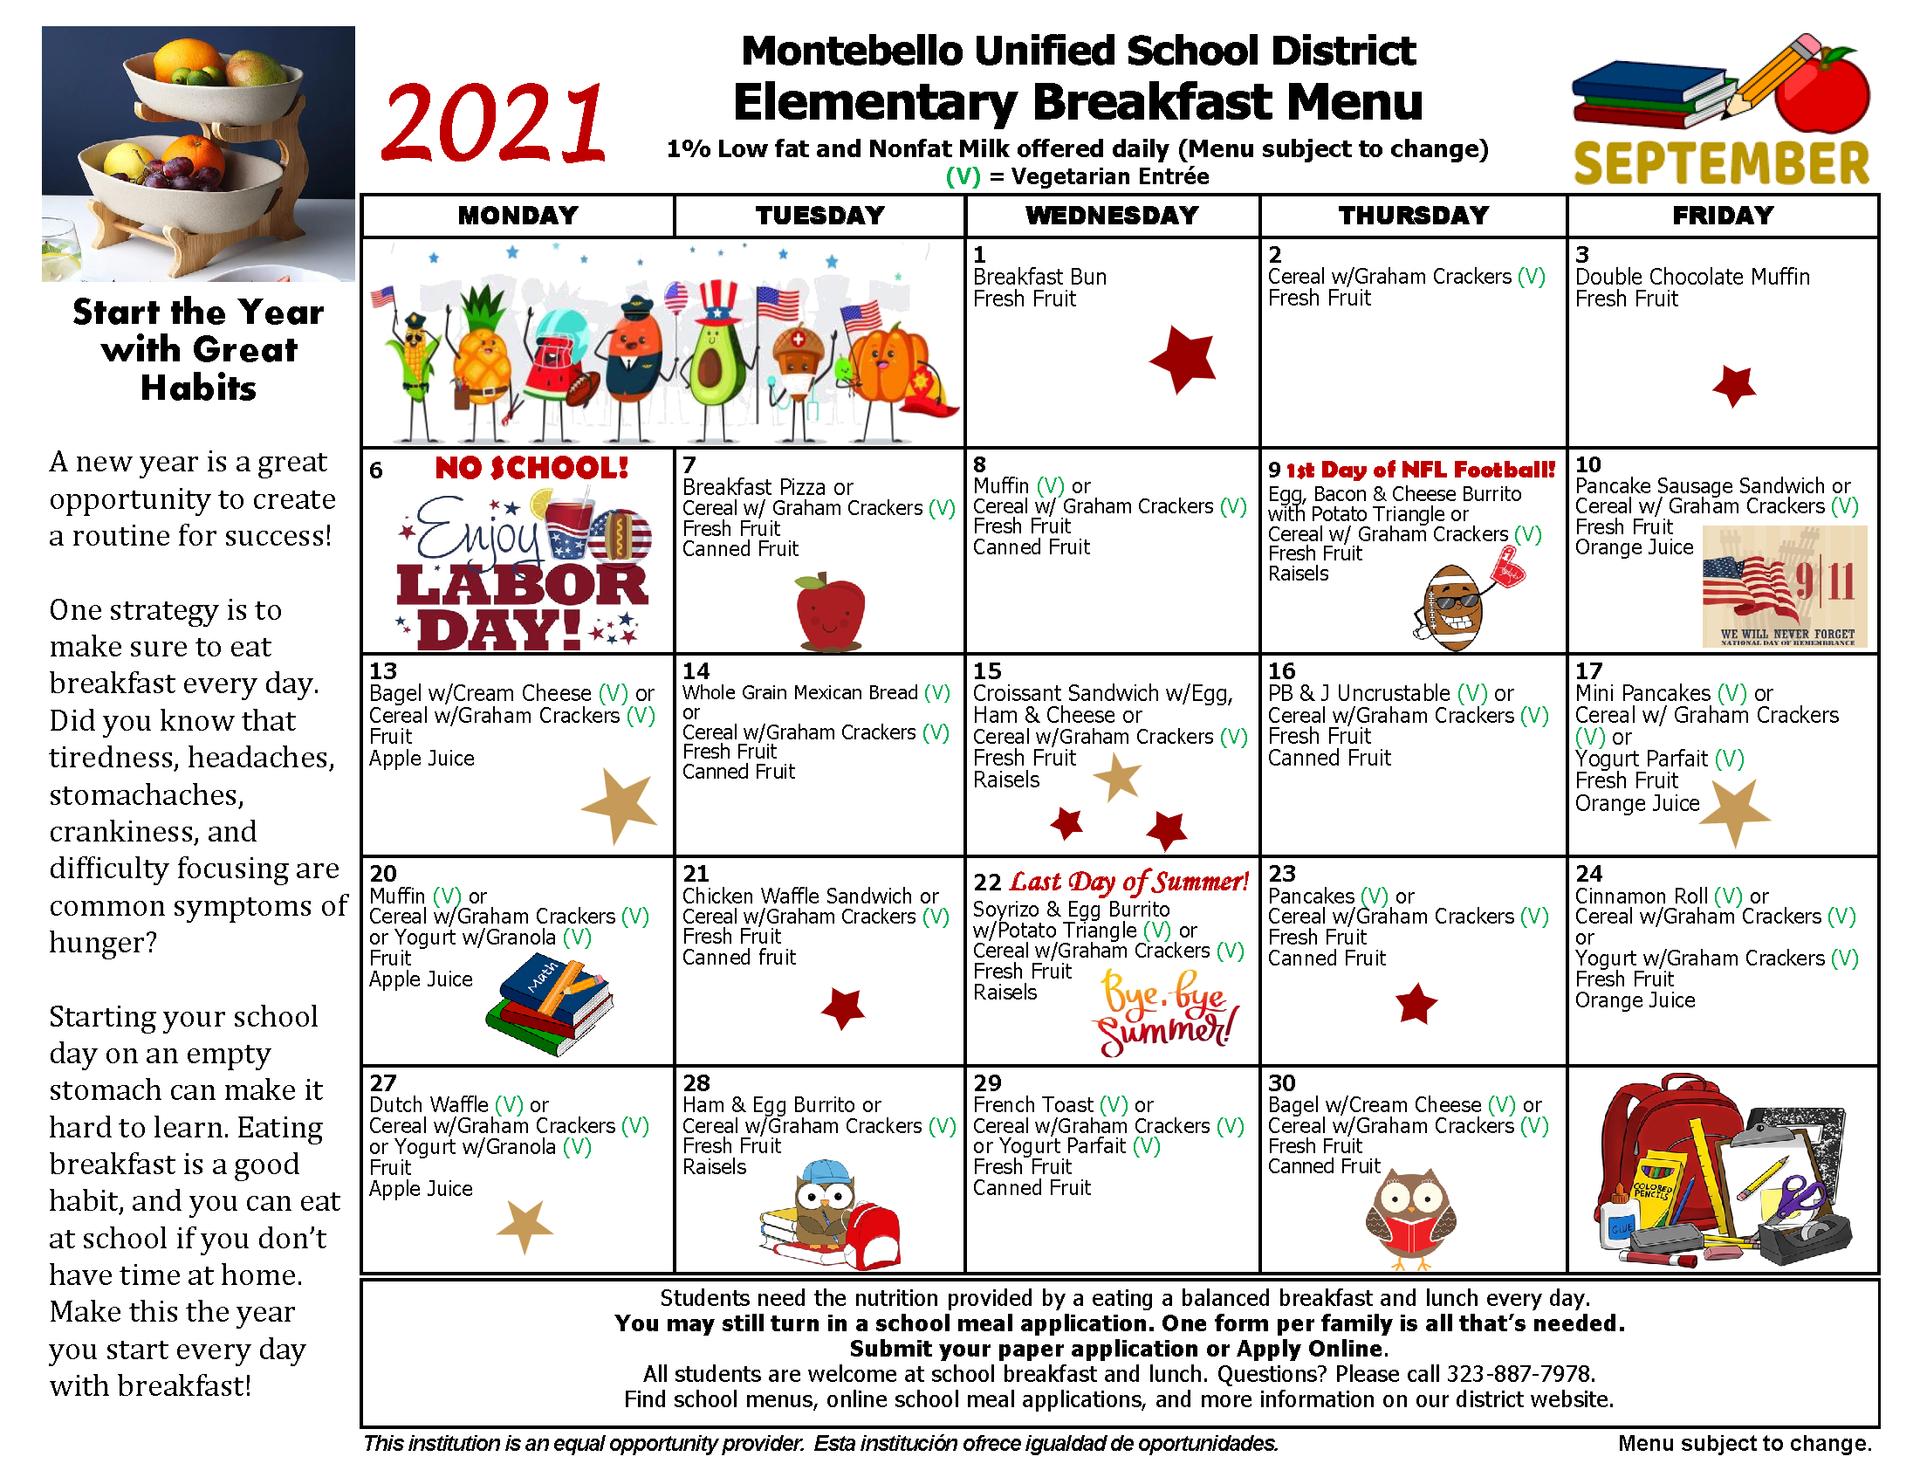 Elementary Breakfast Menu September 2021